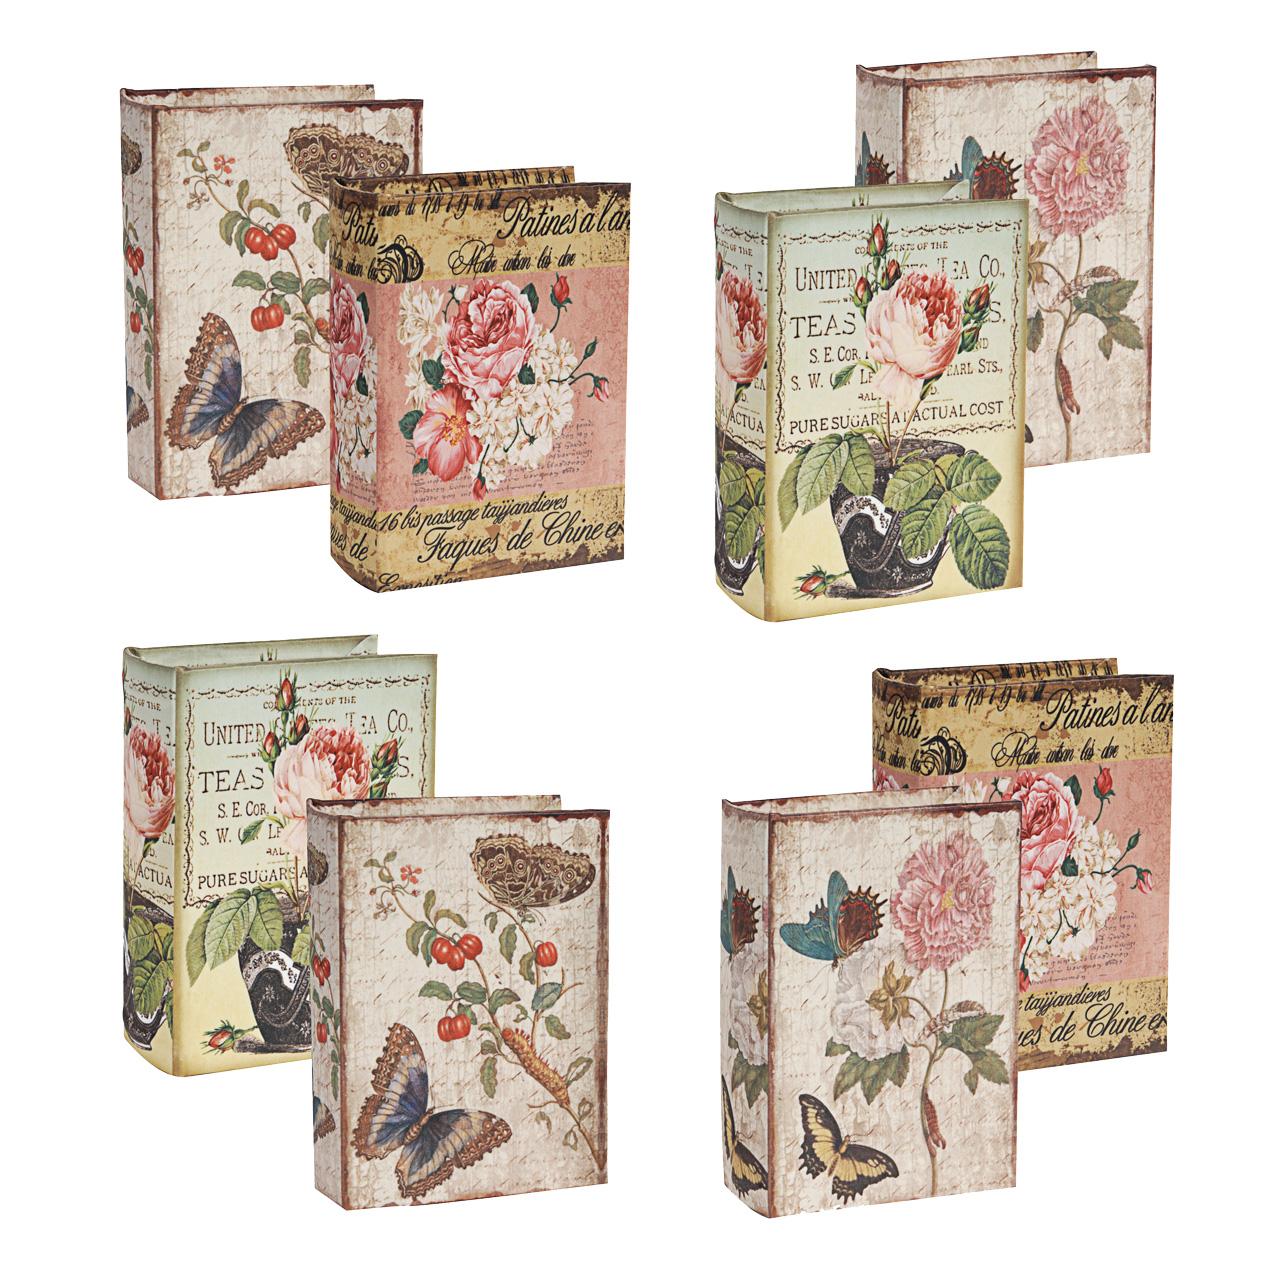 {} ARTEVALUCE Шкатулка-книга Lorrie (5х10х14 см - 8 шт) неактивный шкатулка сувенир летний сад 10 5 5 8 см